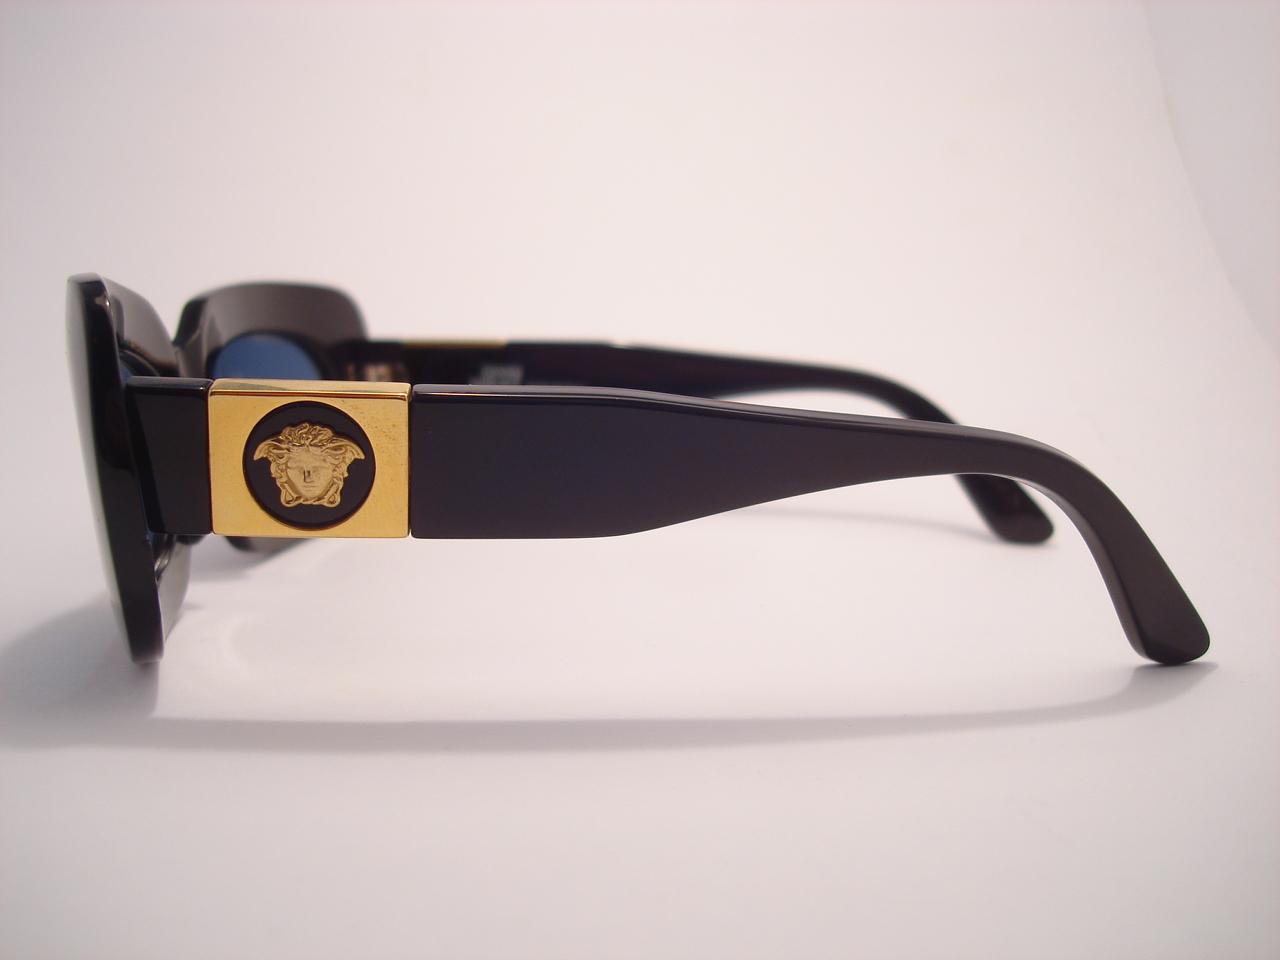 8ac9114230c Replica Versace Vintage Sunglasses